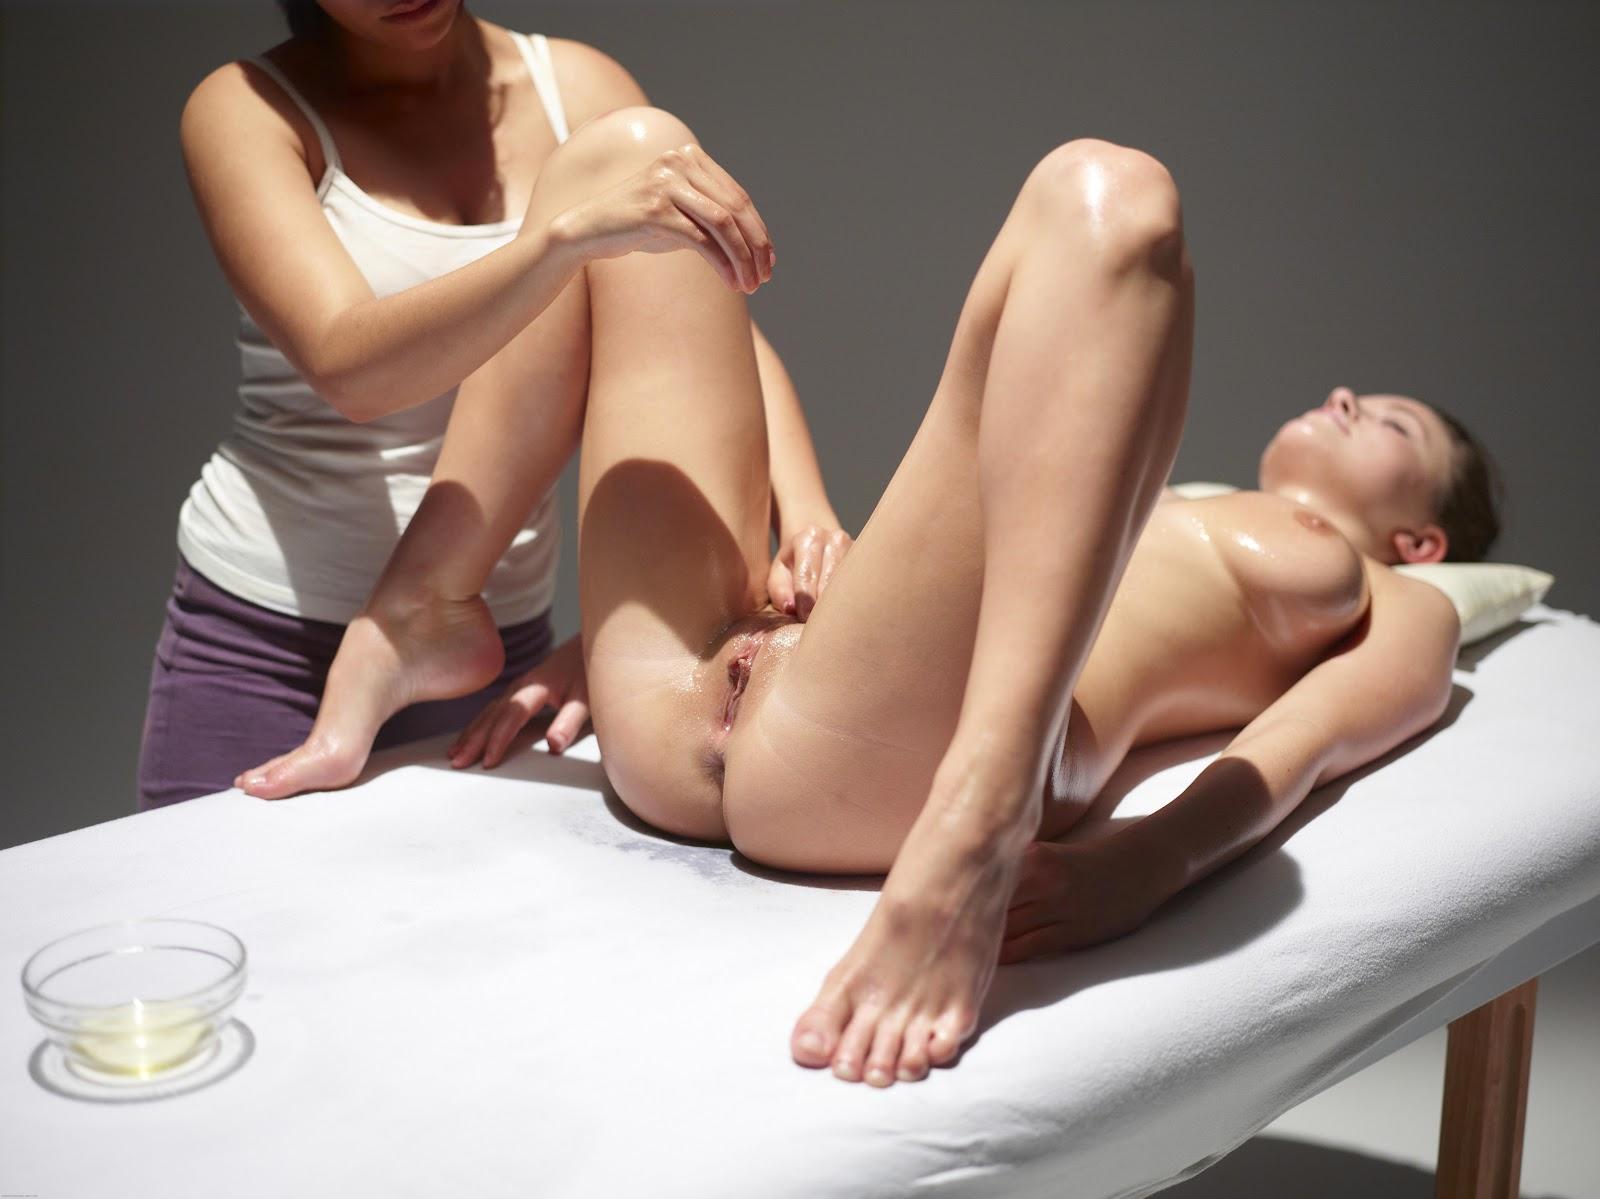 thai massage århus silkeborgvej top thai massage vejle